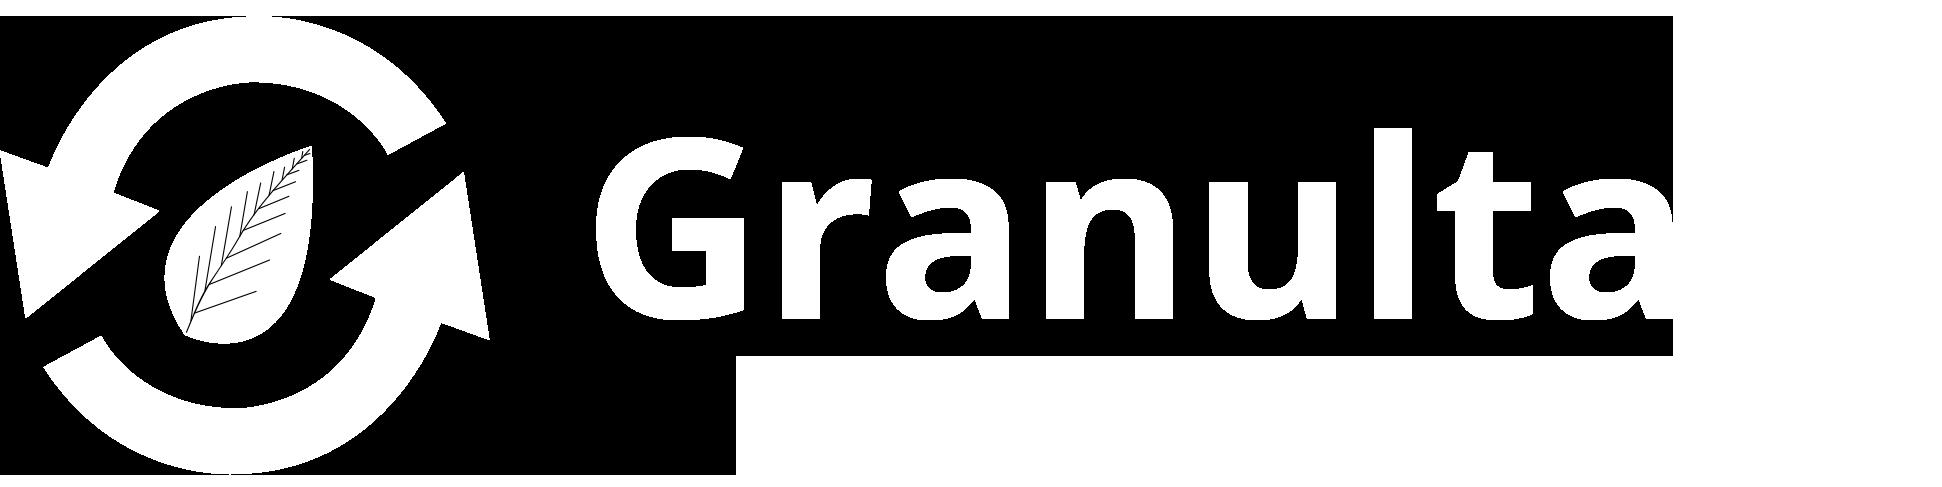 Granulta